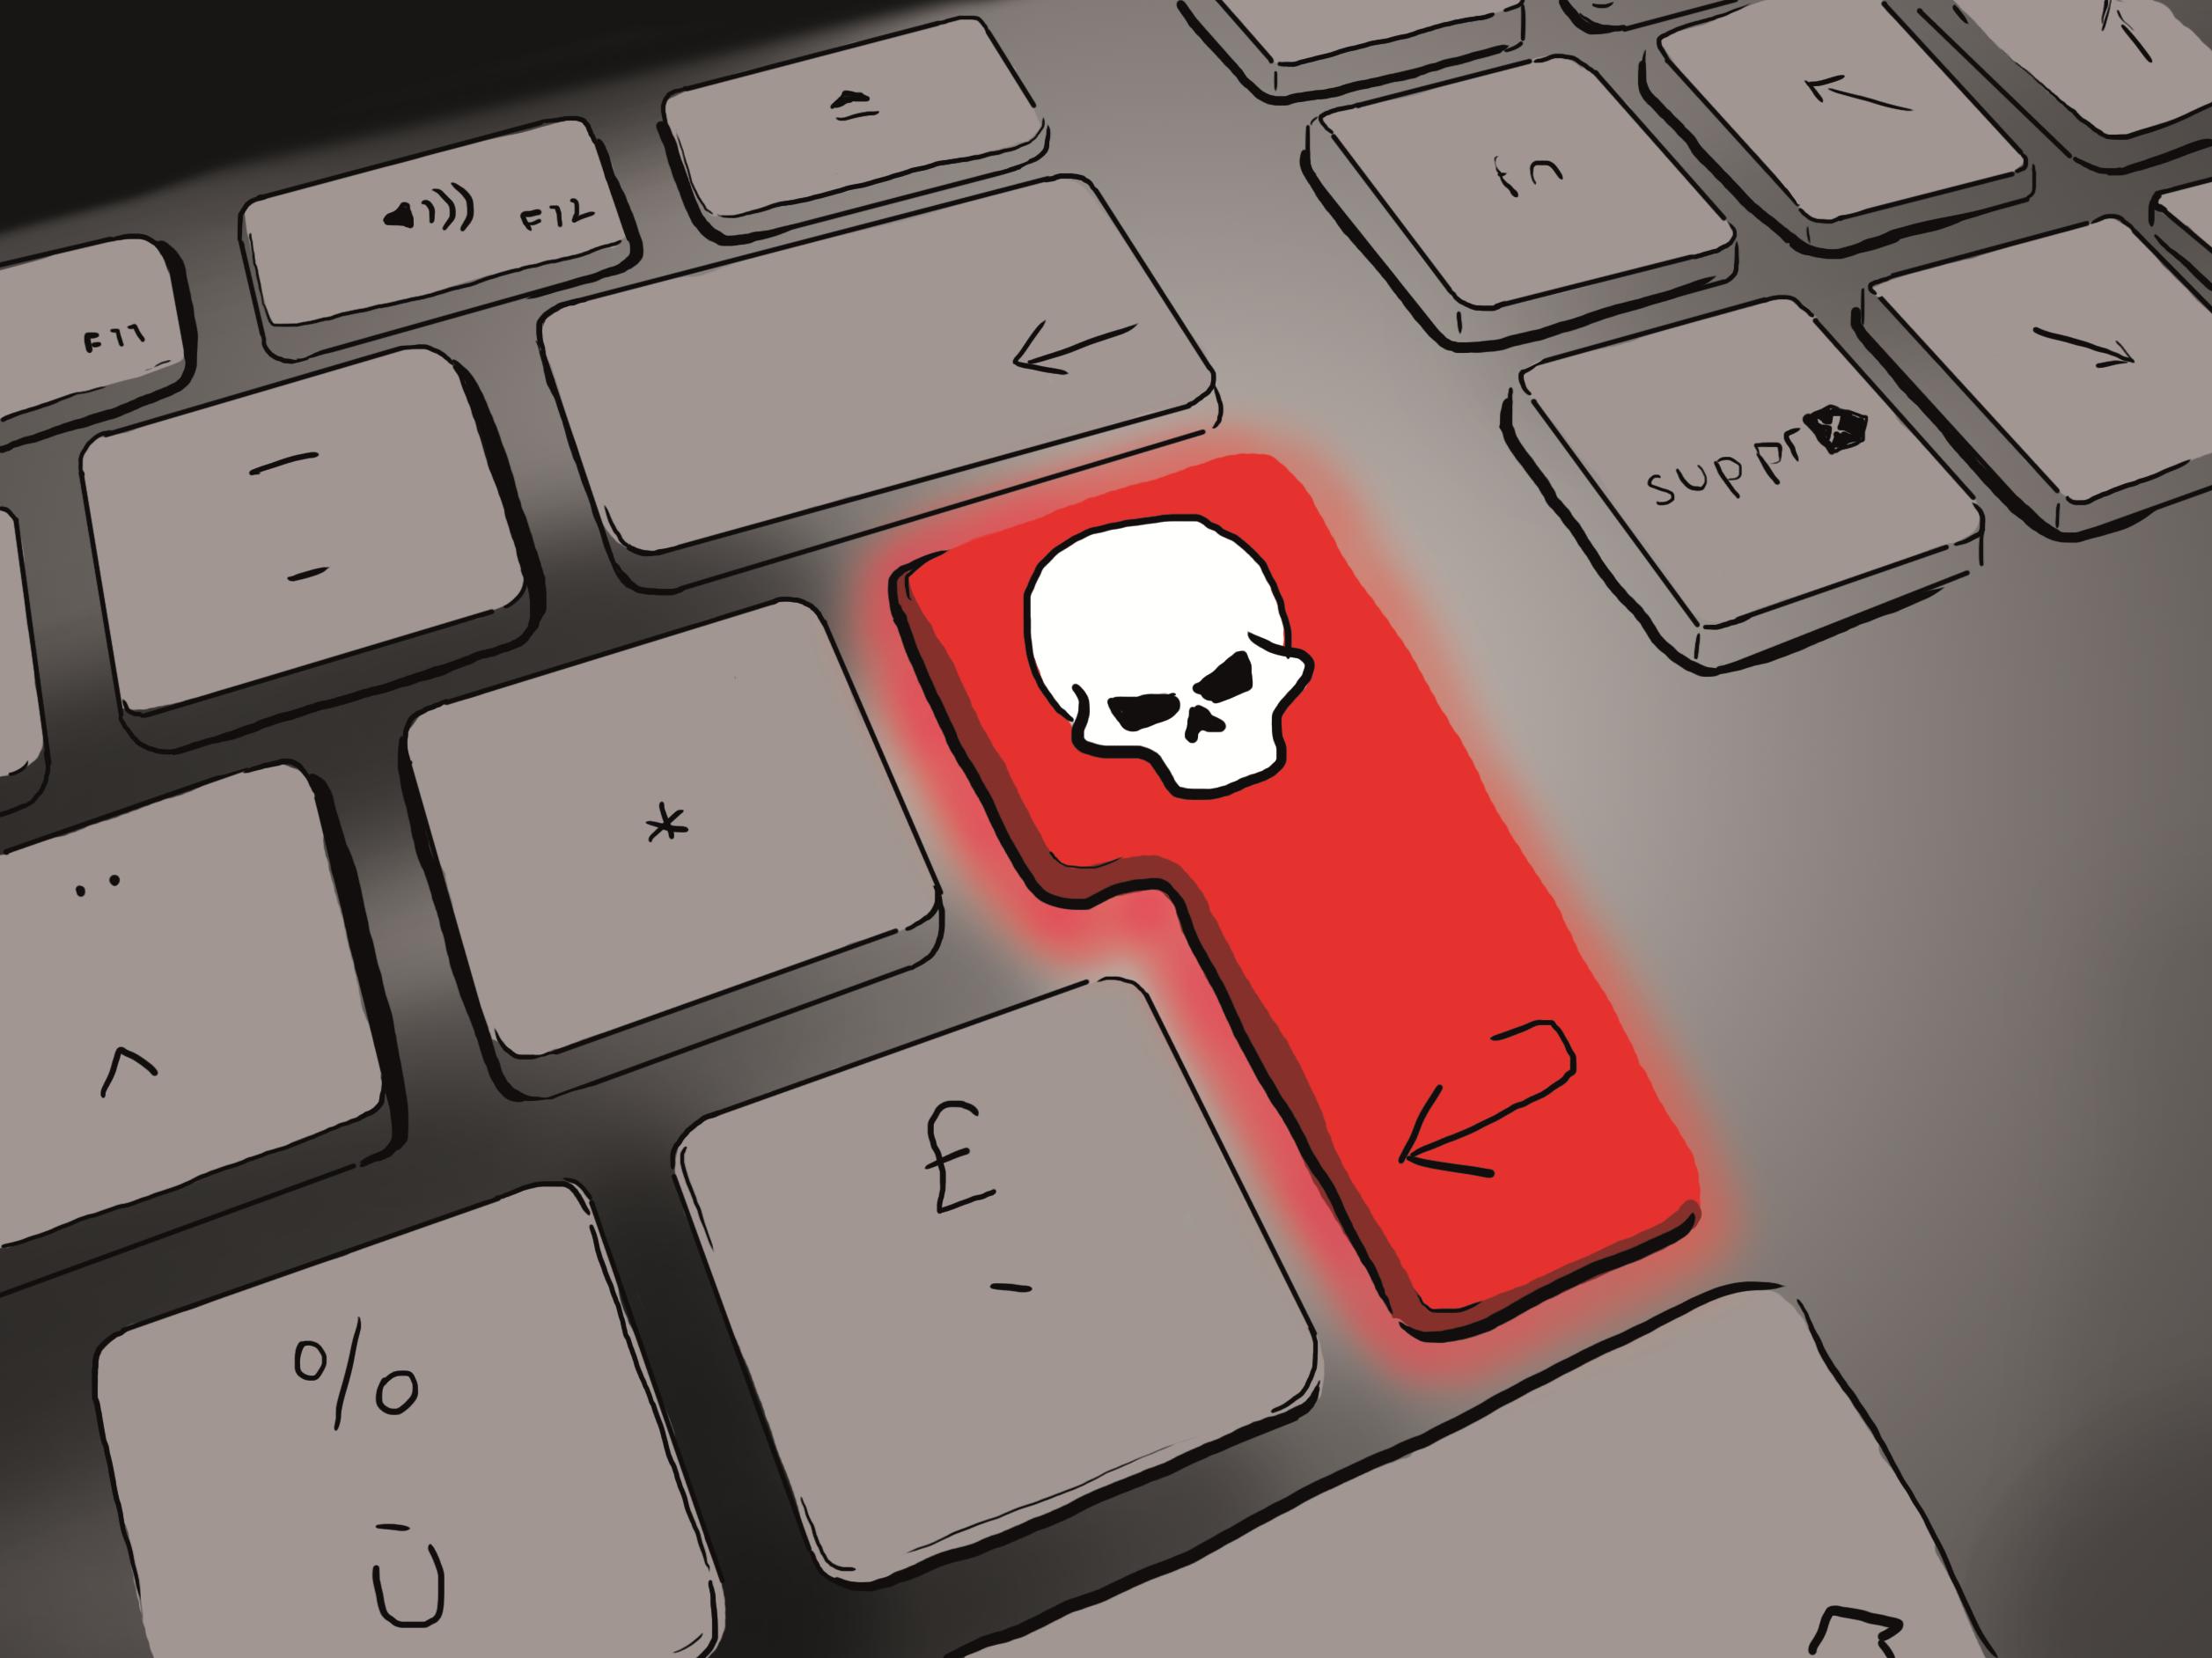 Cyber Security Night am 26. Jänner 2017